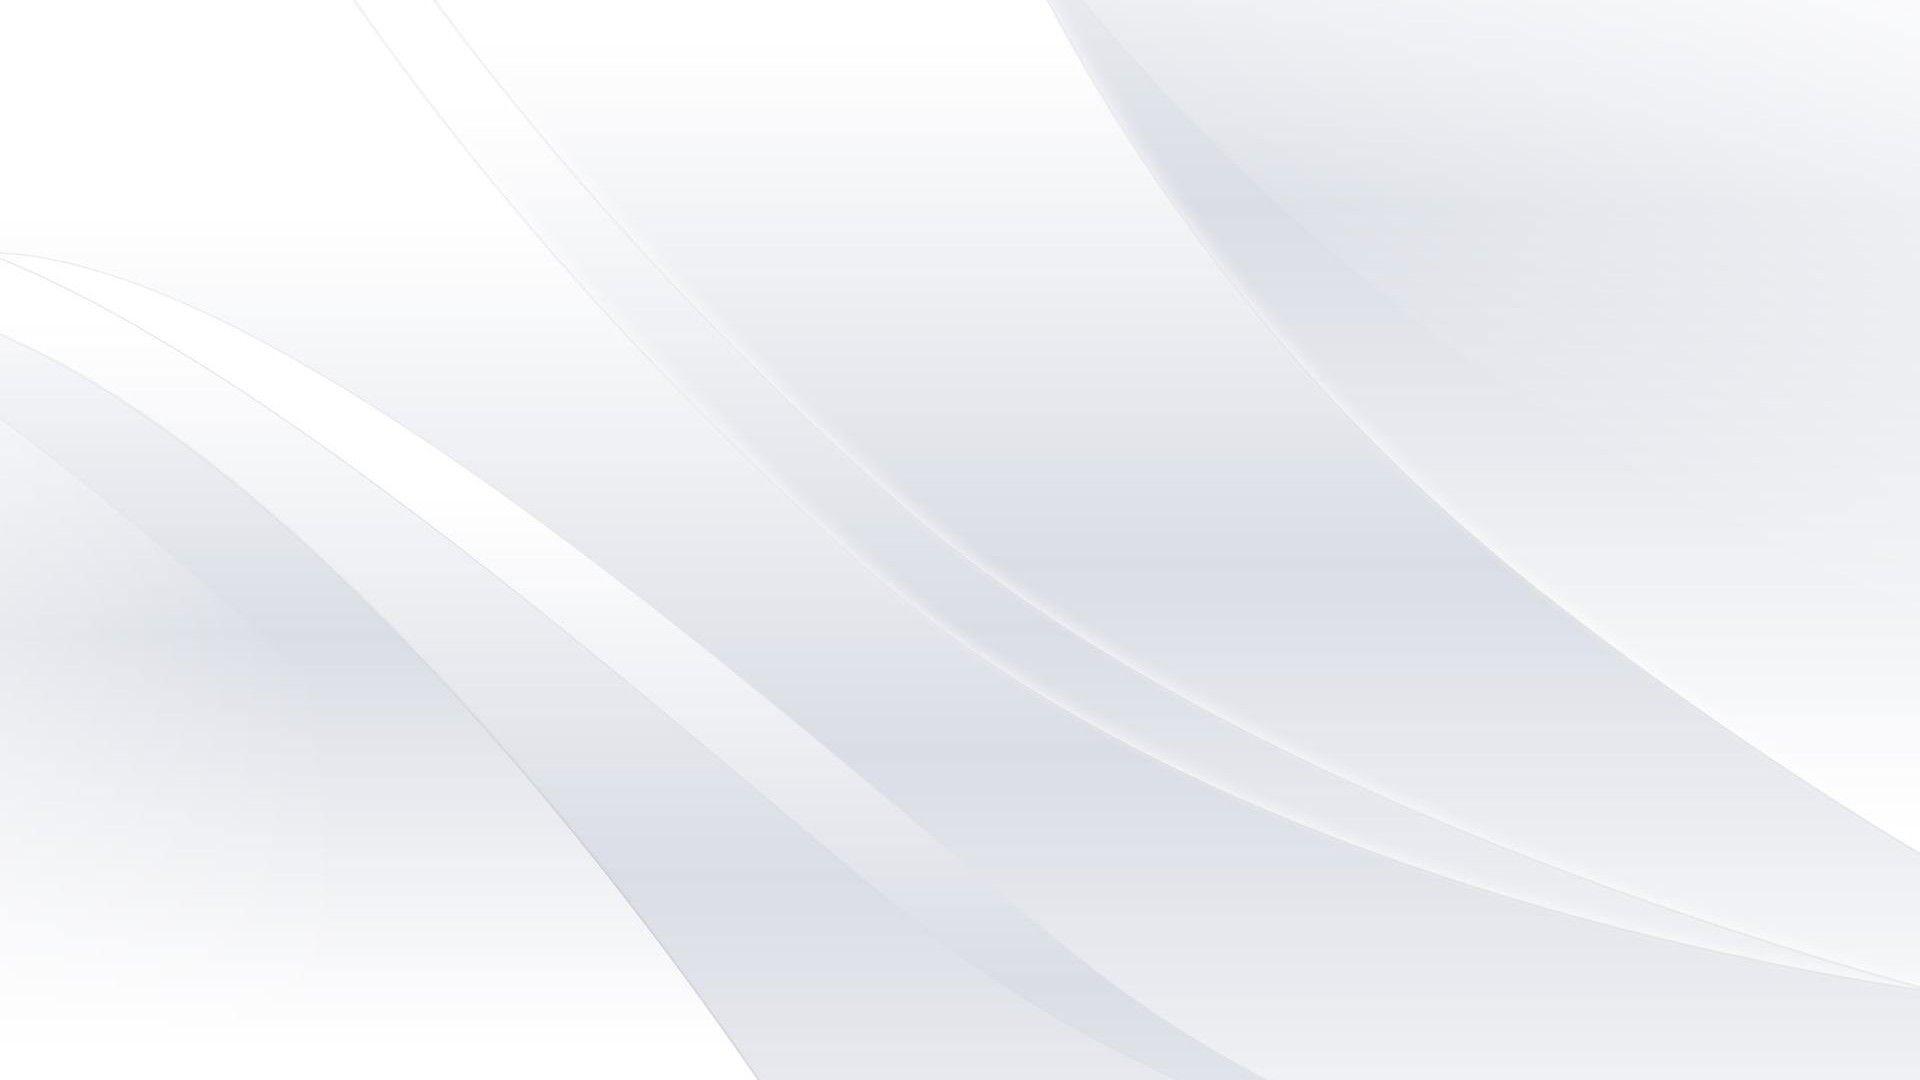 Light Grey hd wallpaper download